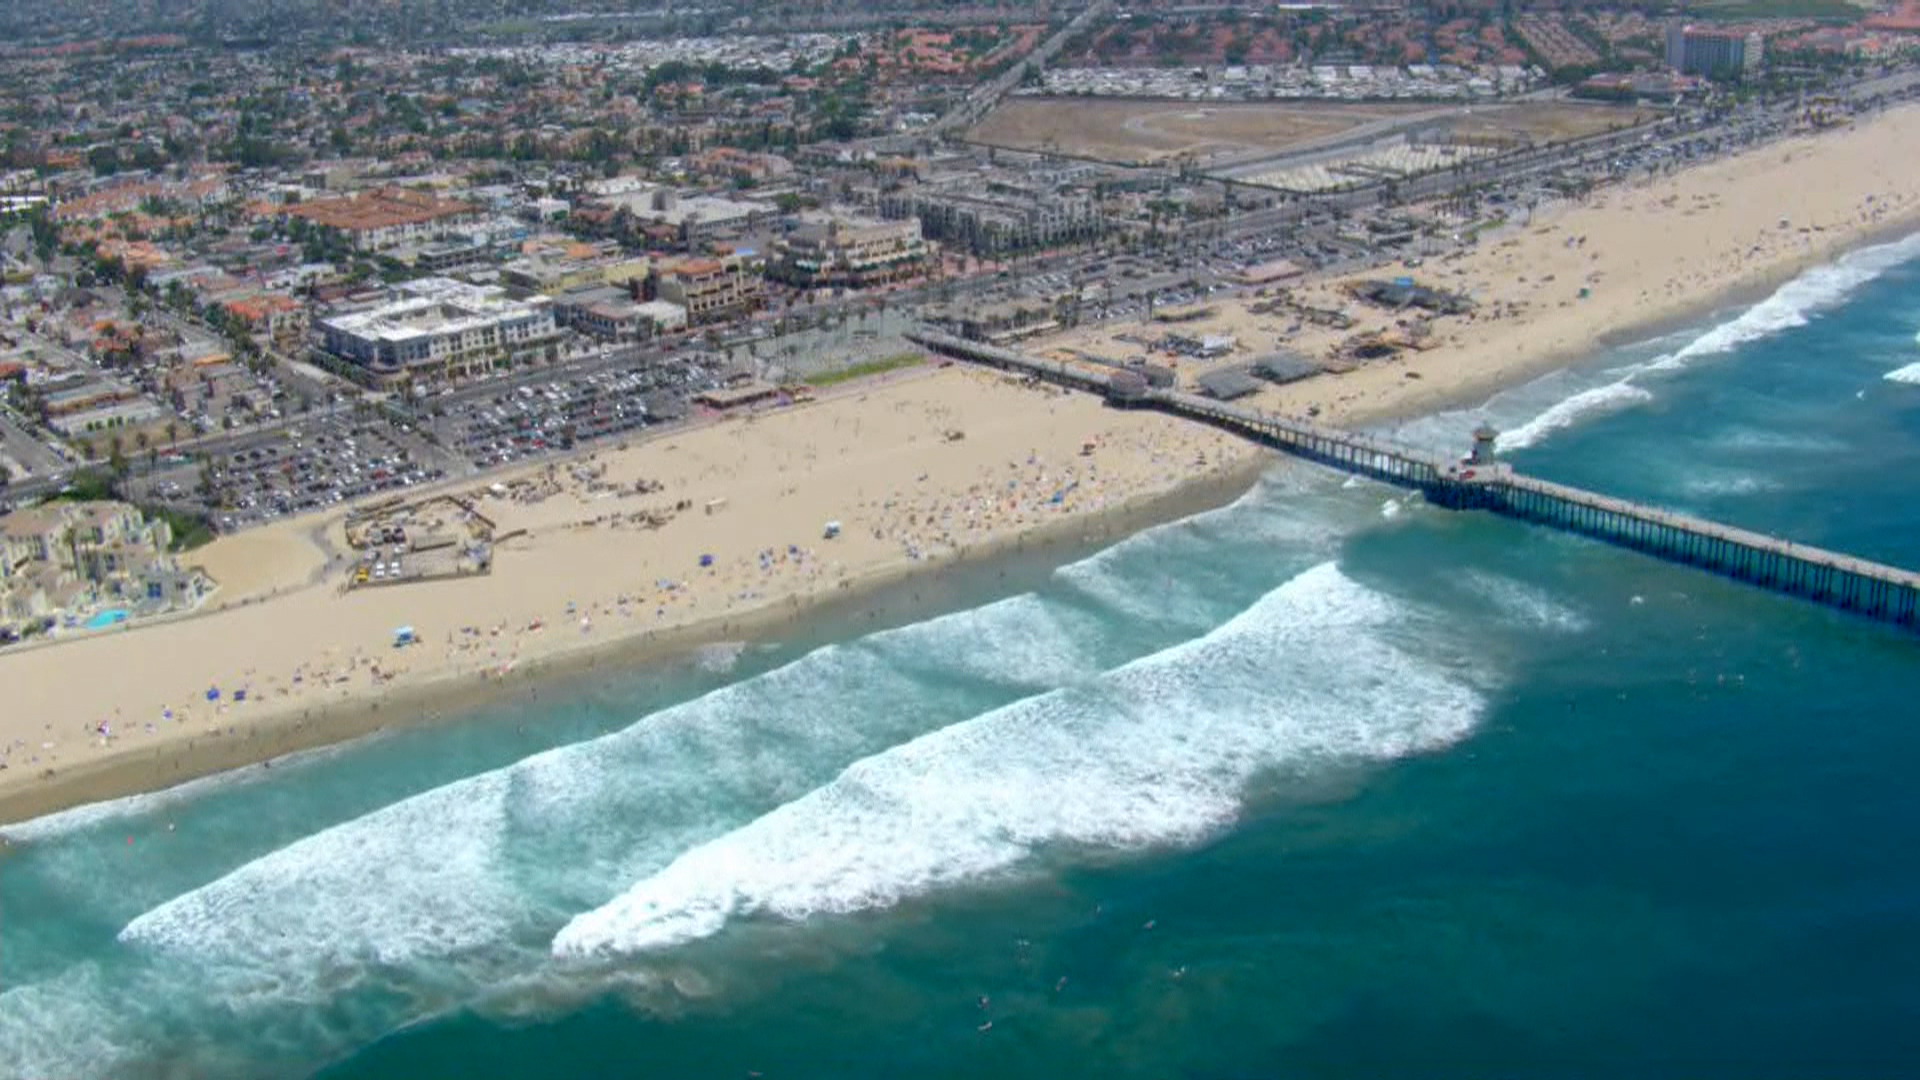 What would happen if a tsunami hit California?